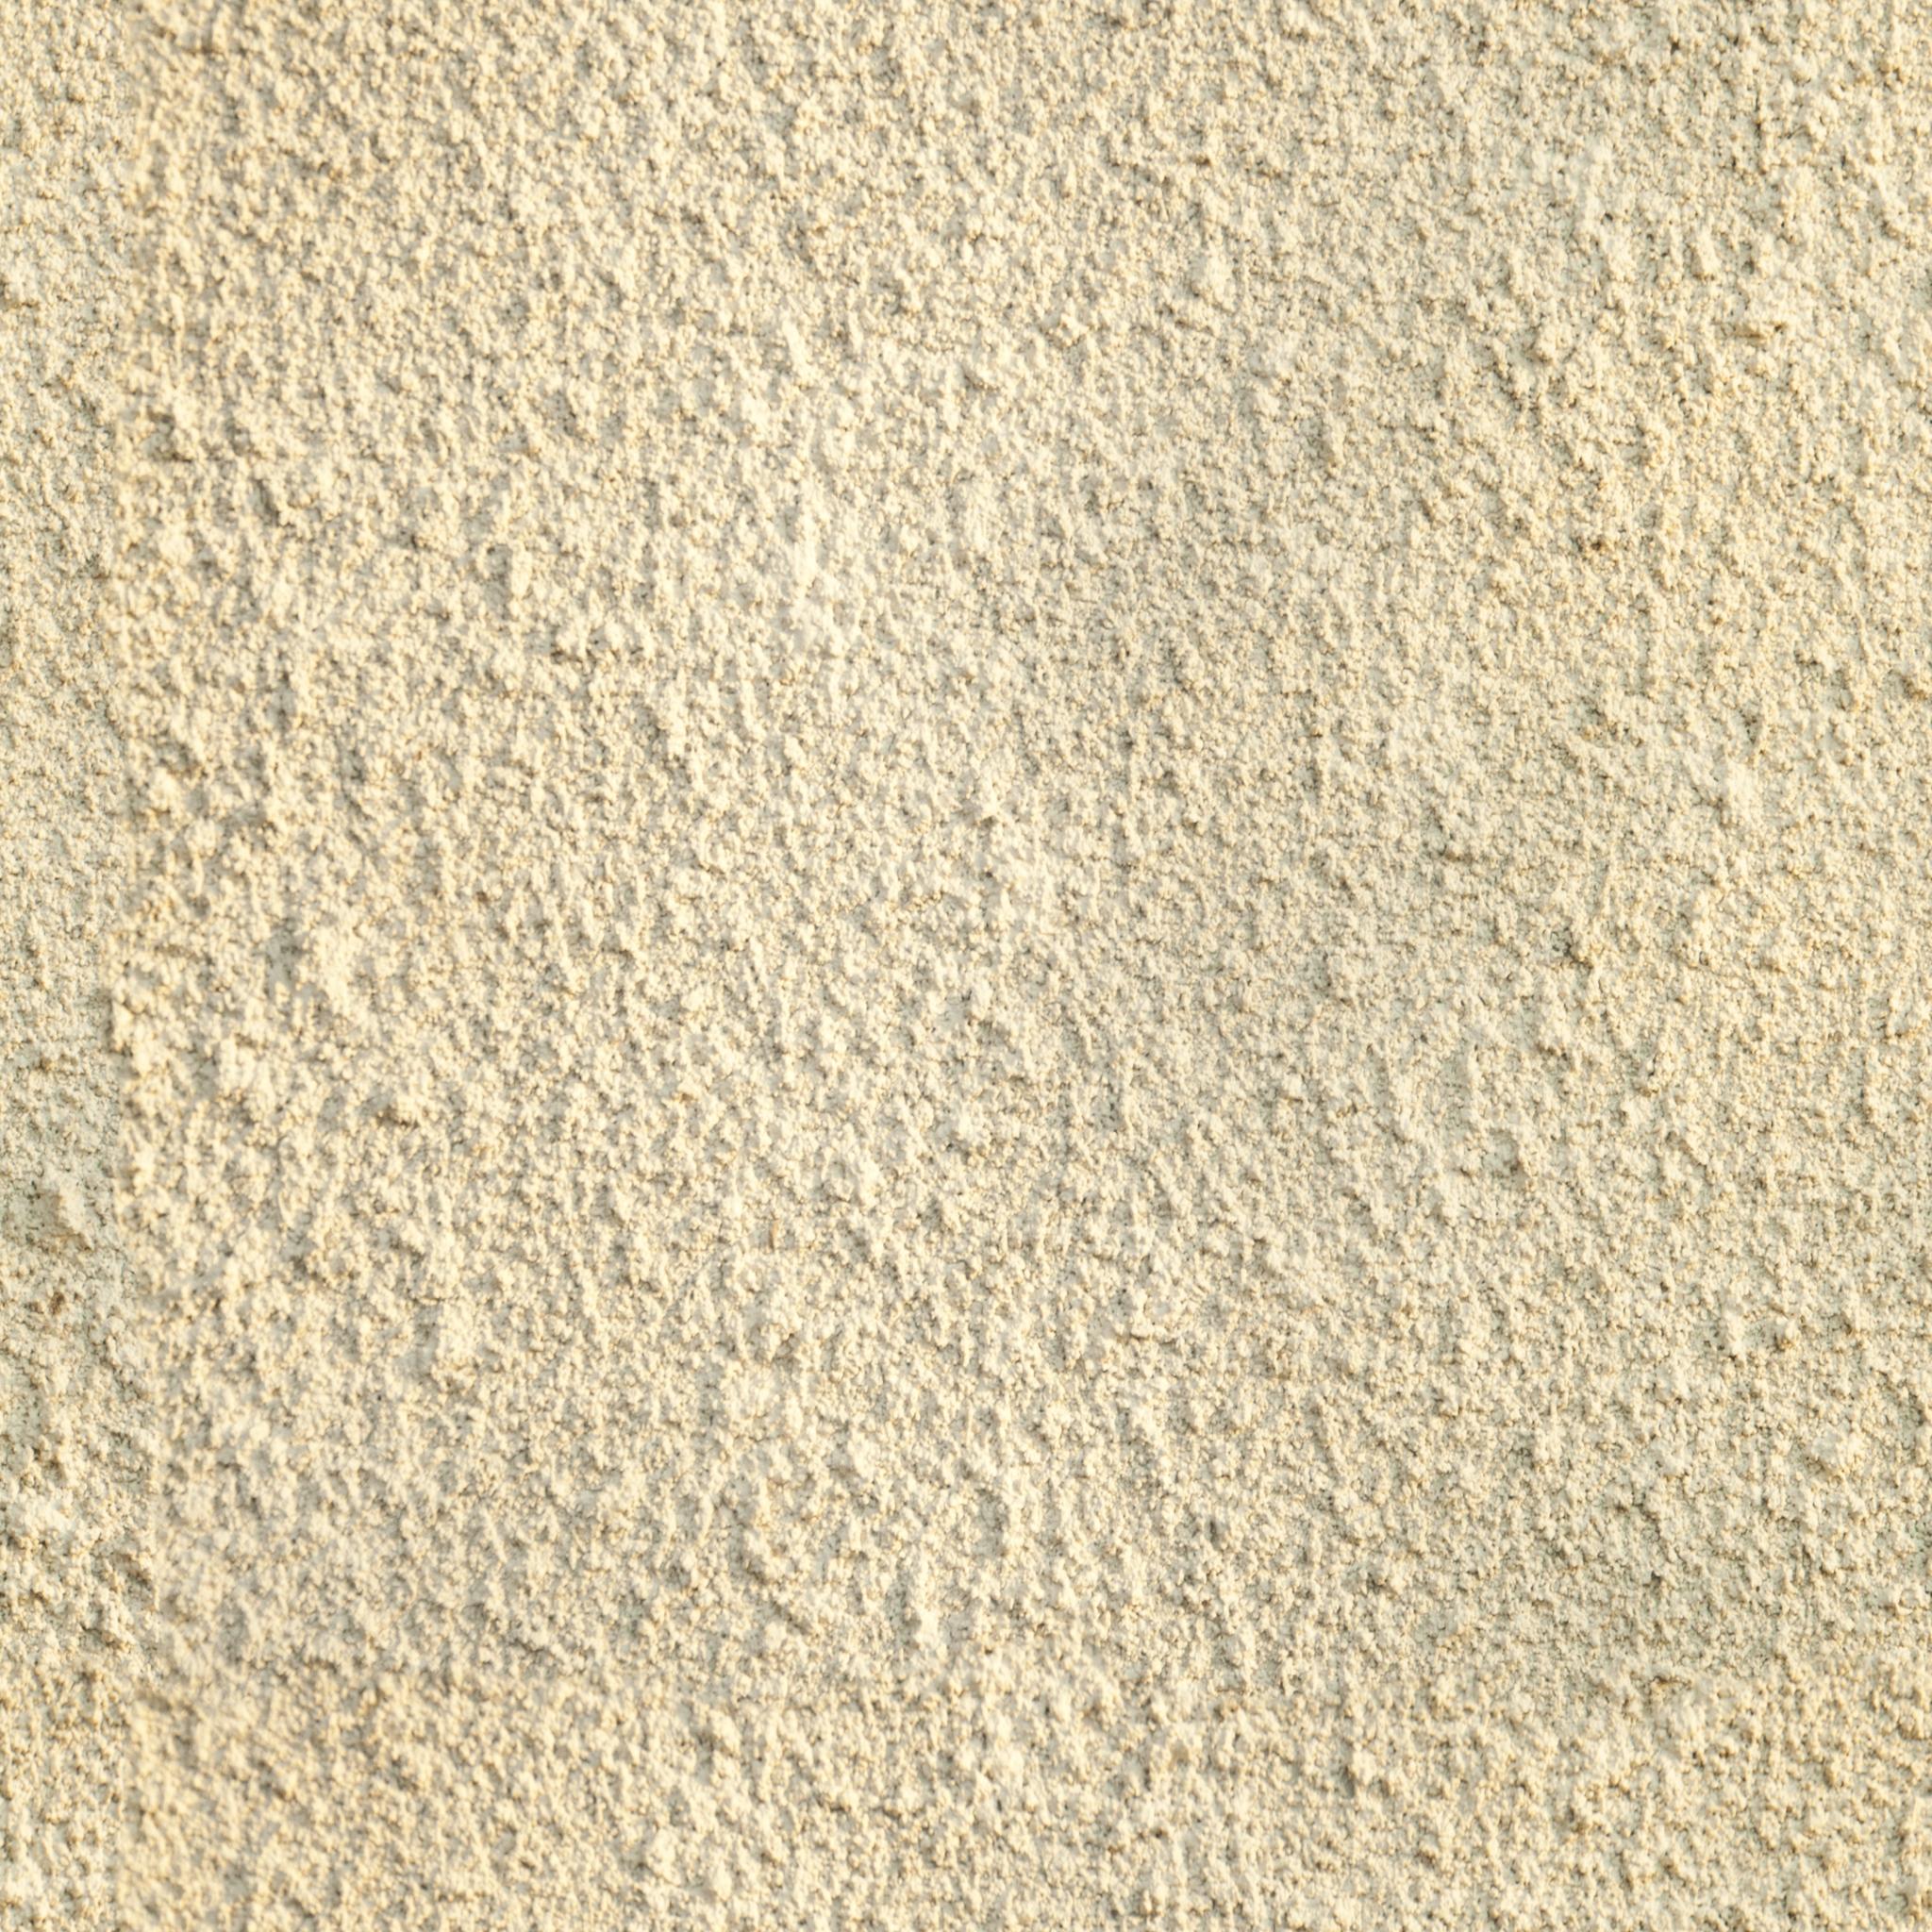 Coarse Off White Stucco.jpg